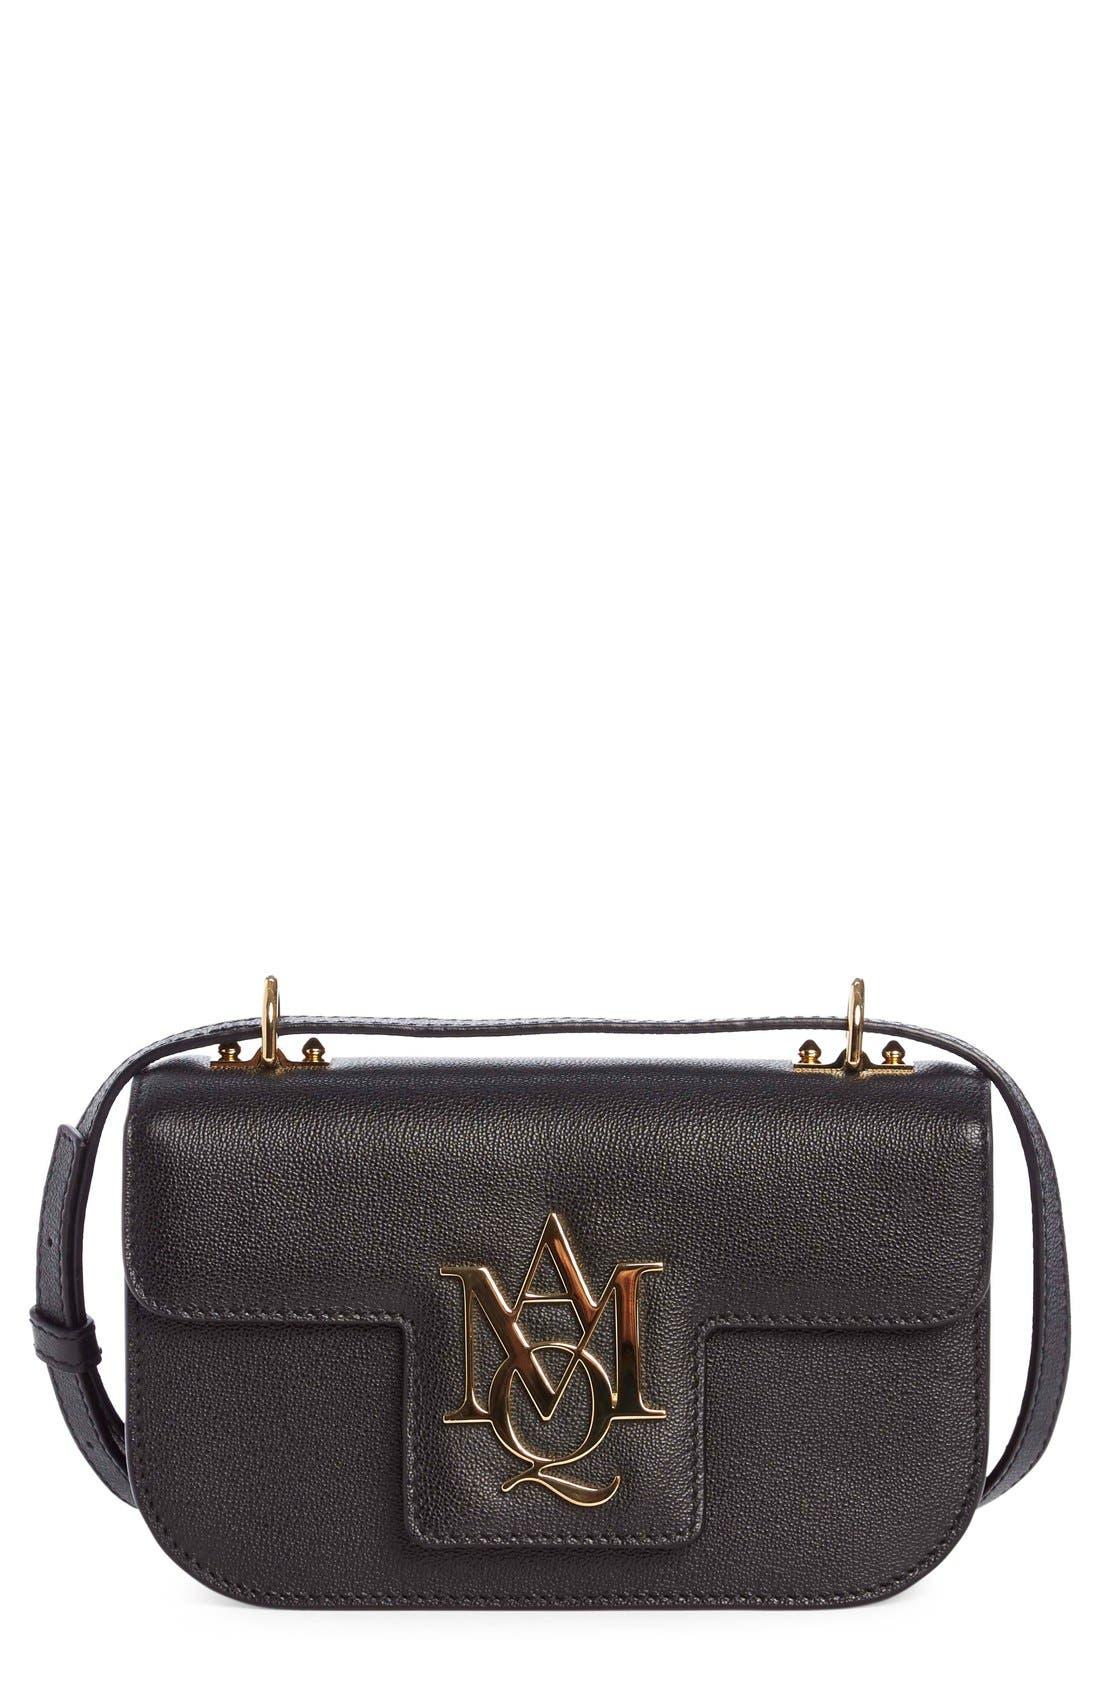 ALEXANDER MCQUEEN, 'Small Insignia' Calfskin Leather Crossbody Satchel, Main thumbnail 1, color, 001